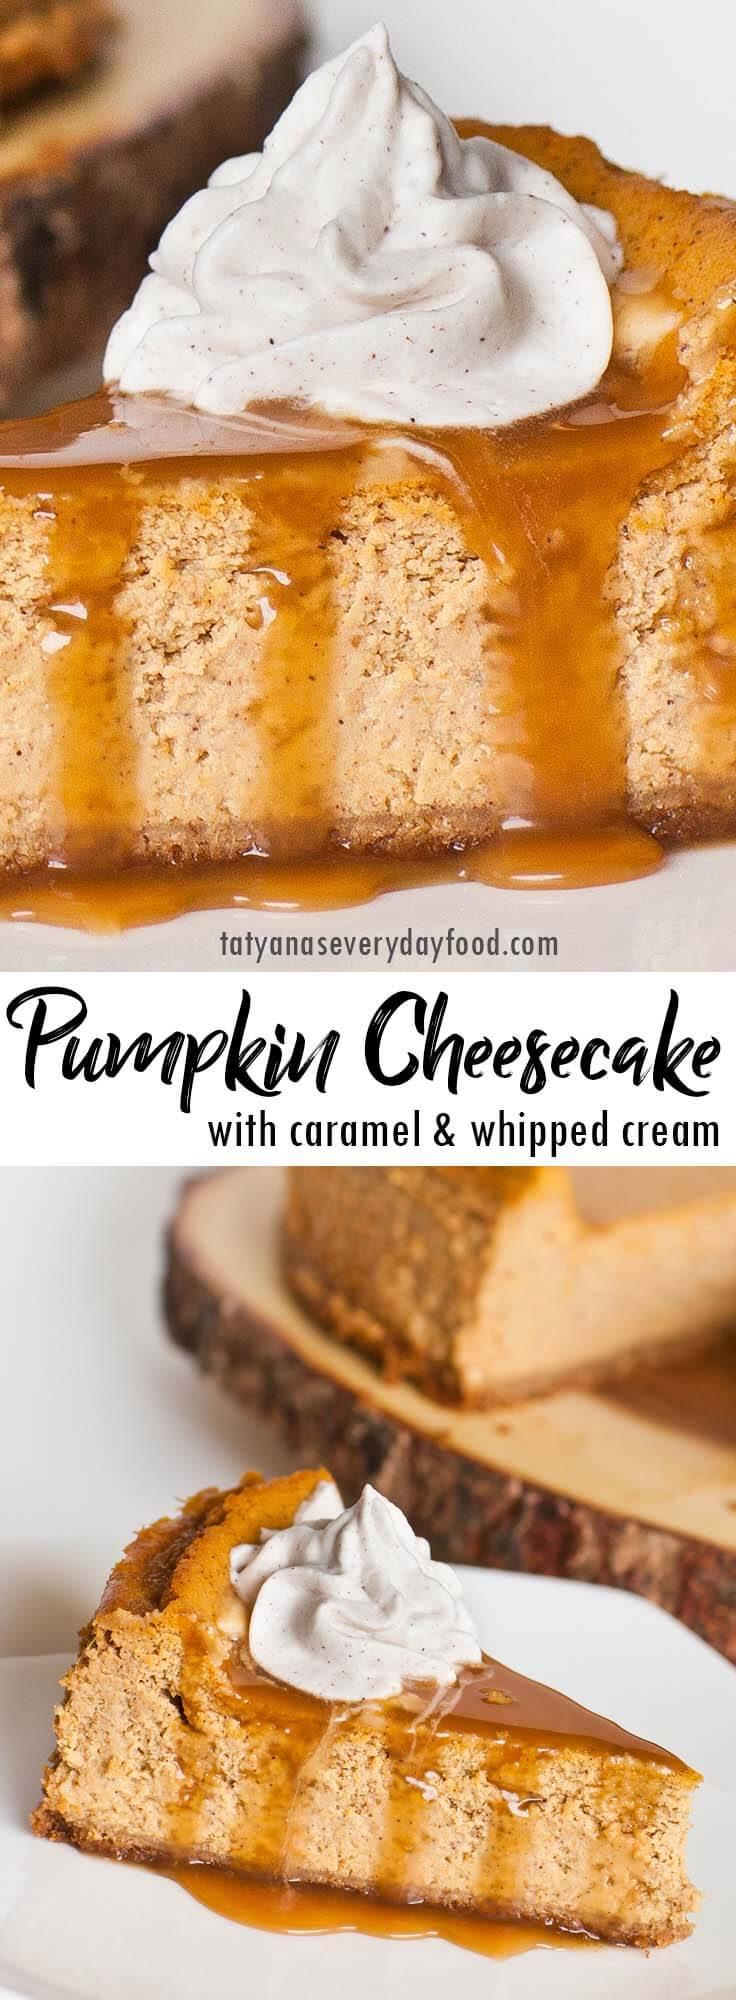 Easy Pumpkin Cheesecake video recipe